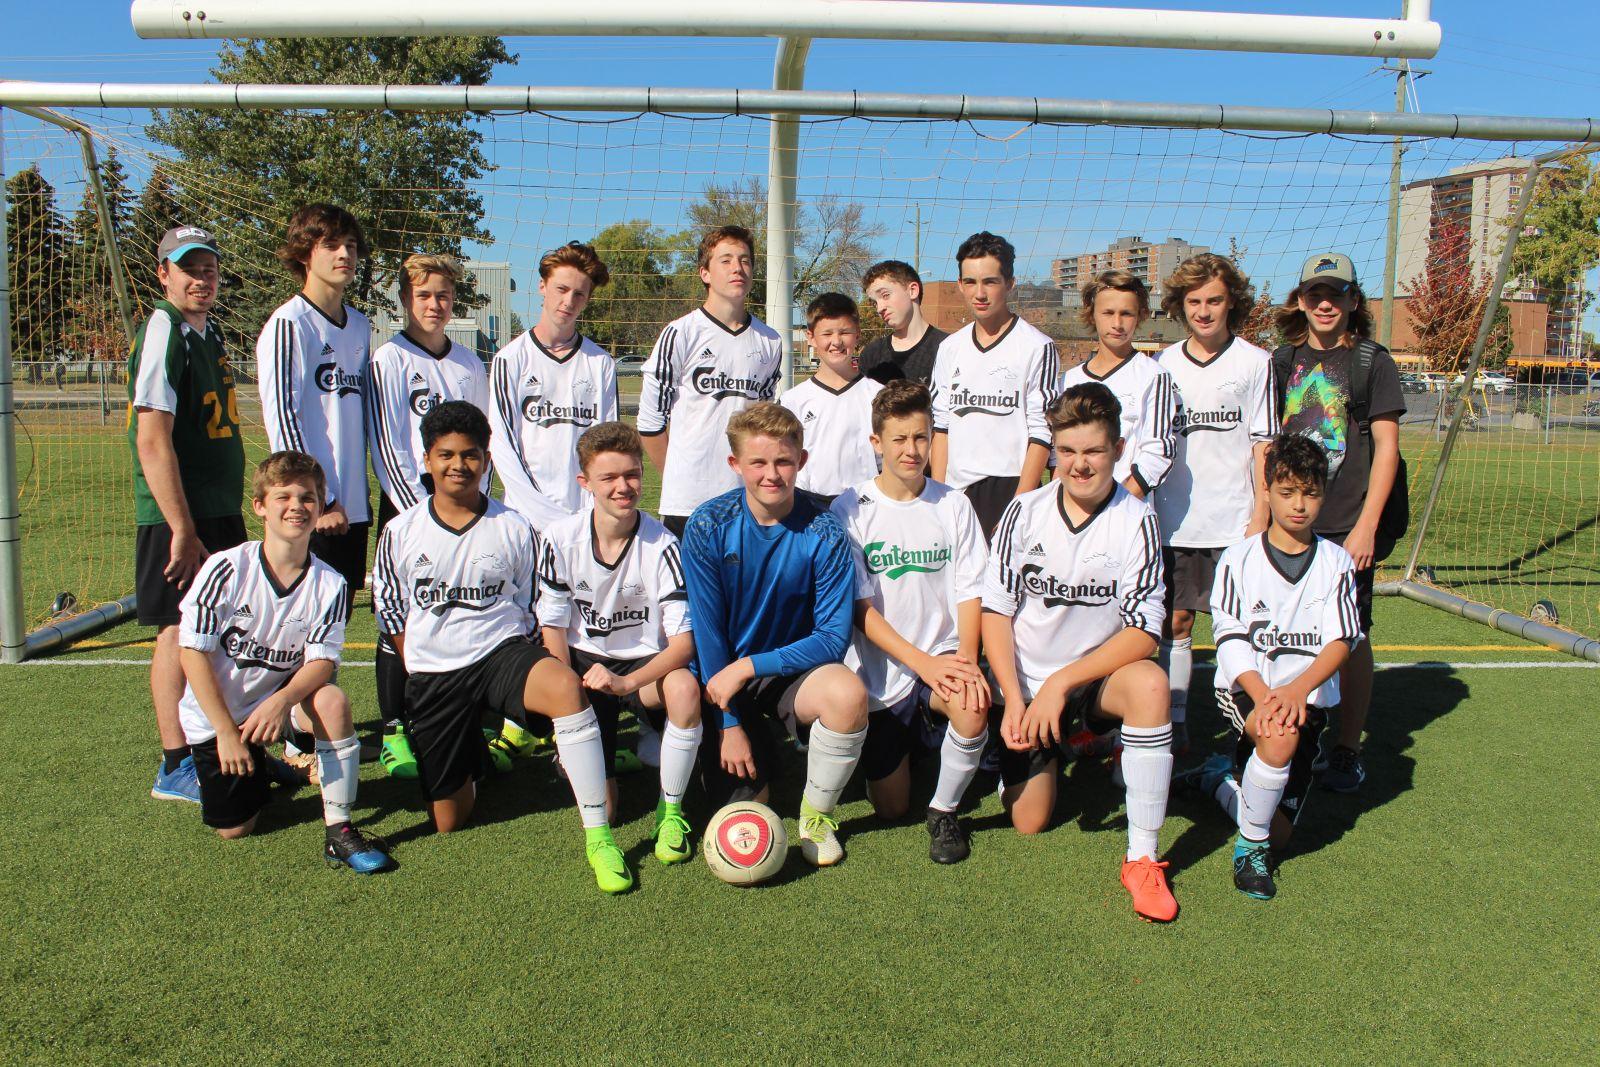 jr boys soccer